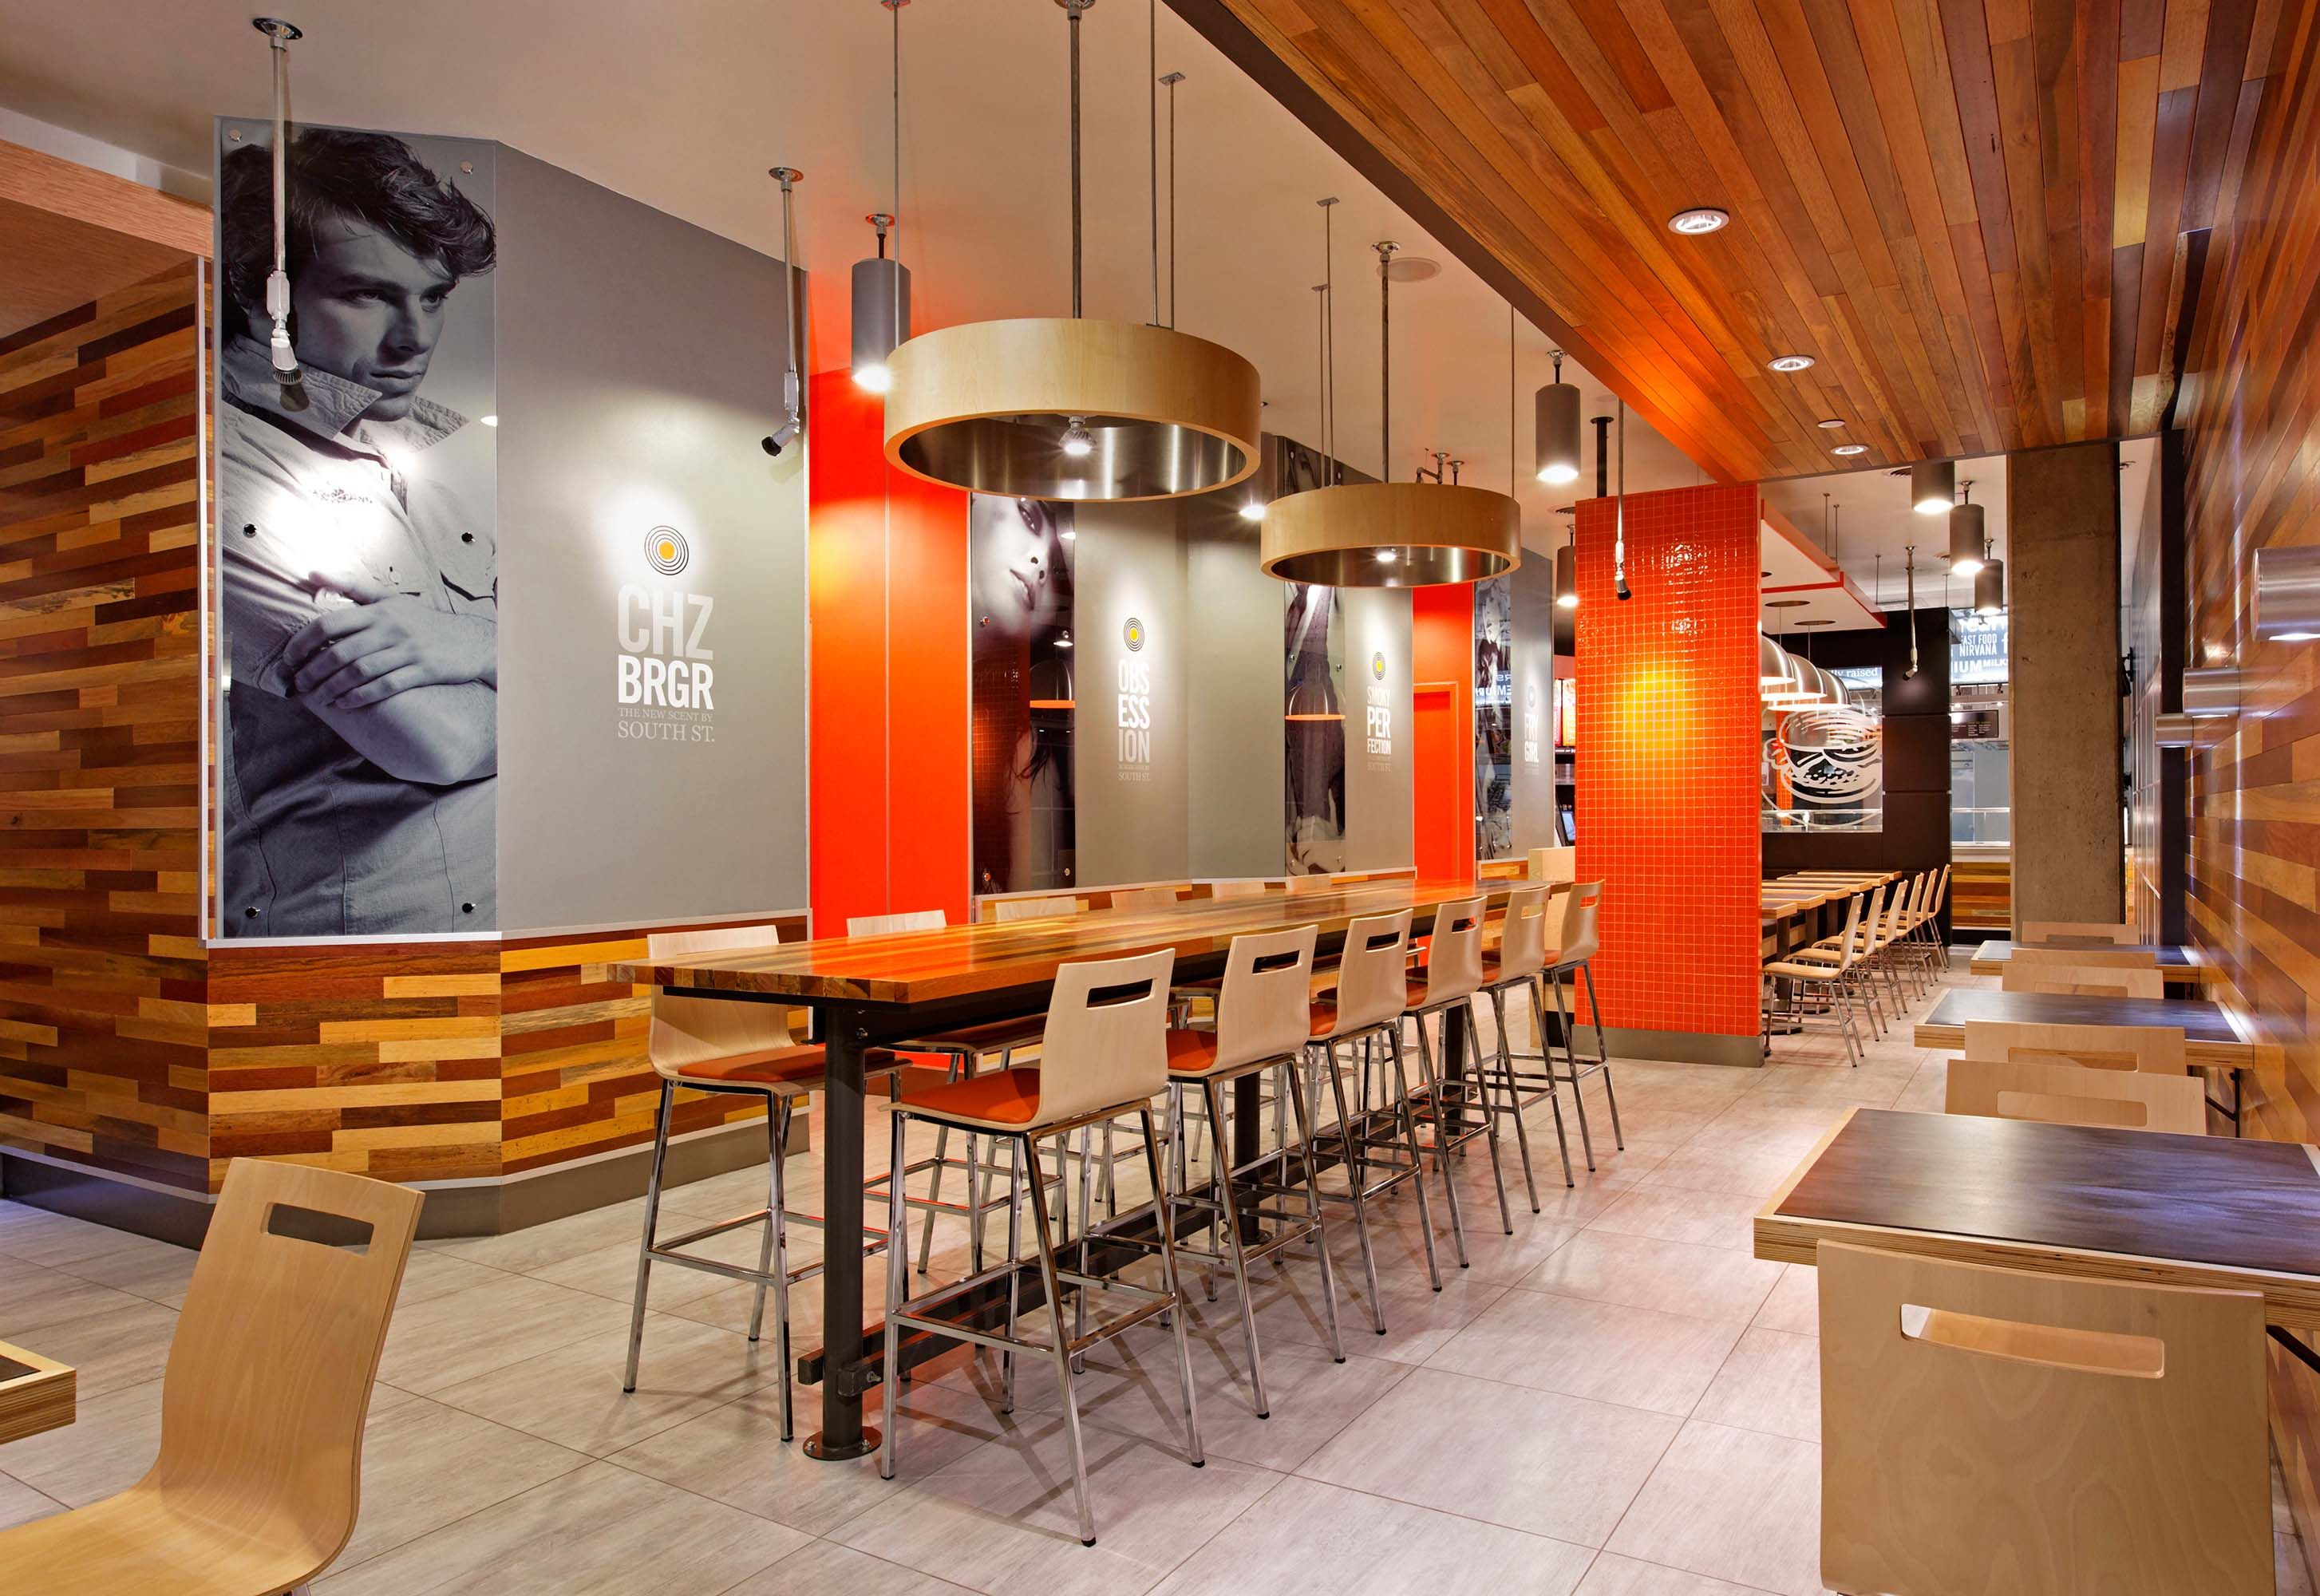 South st burger company interior restaurant design